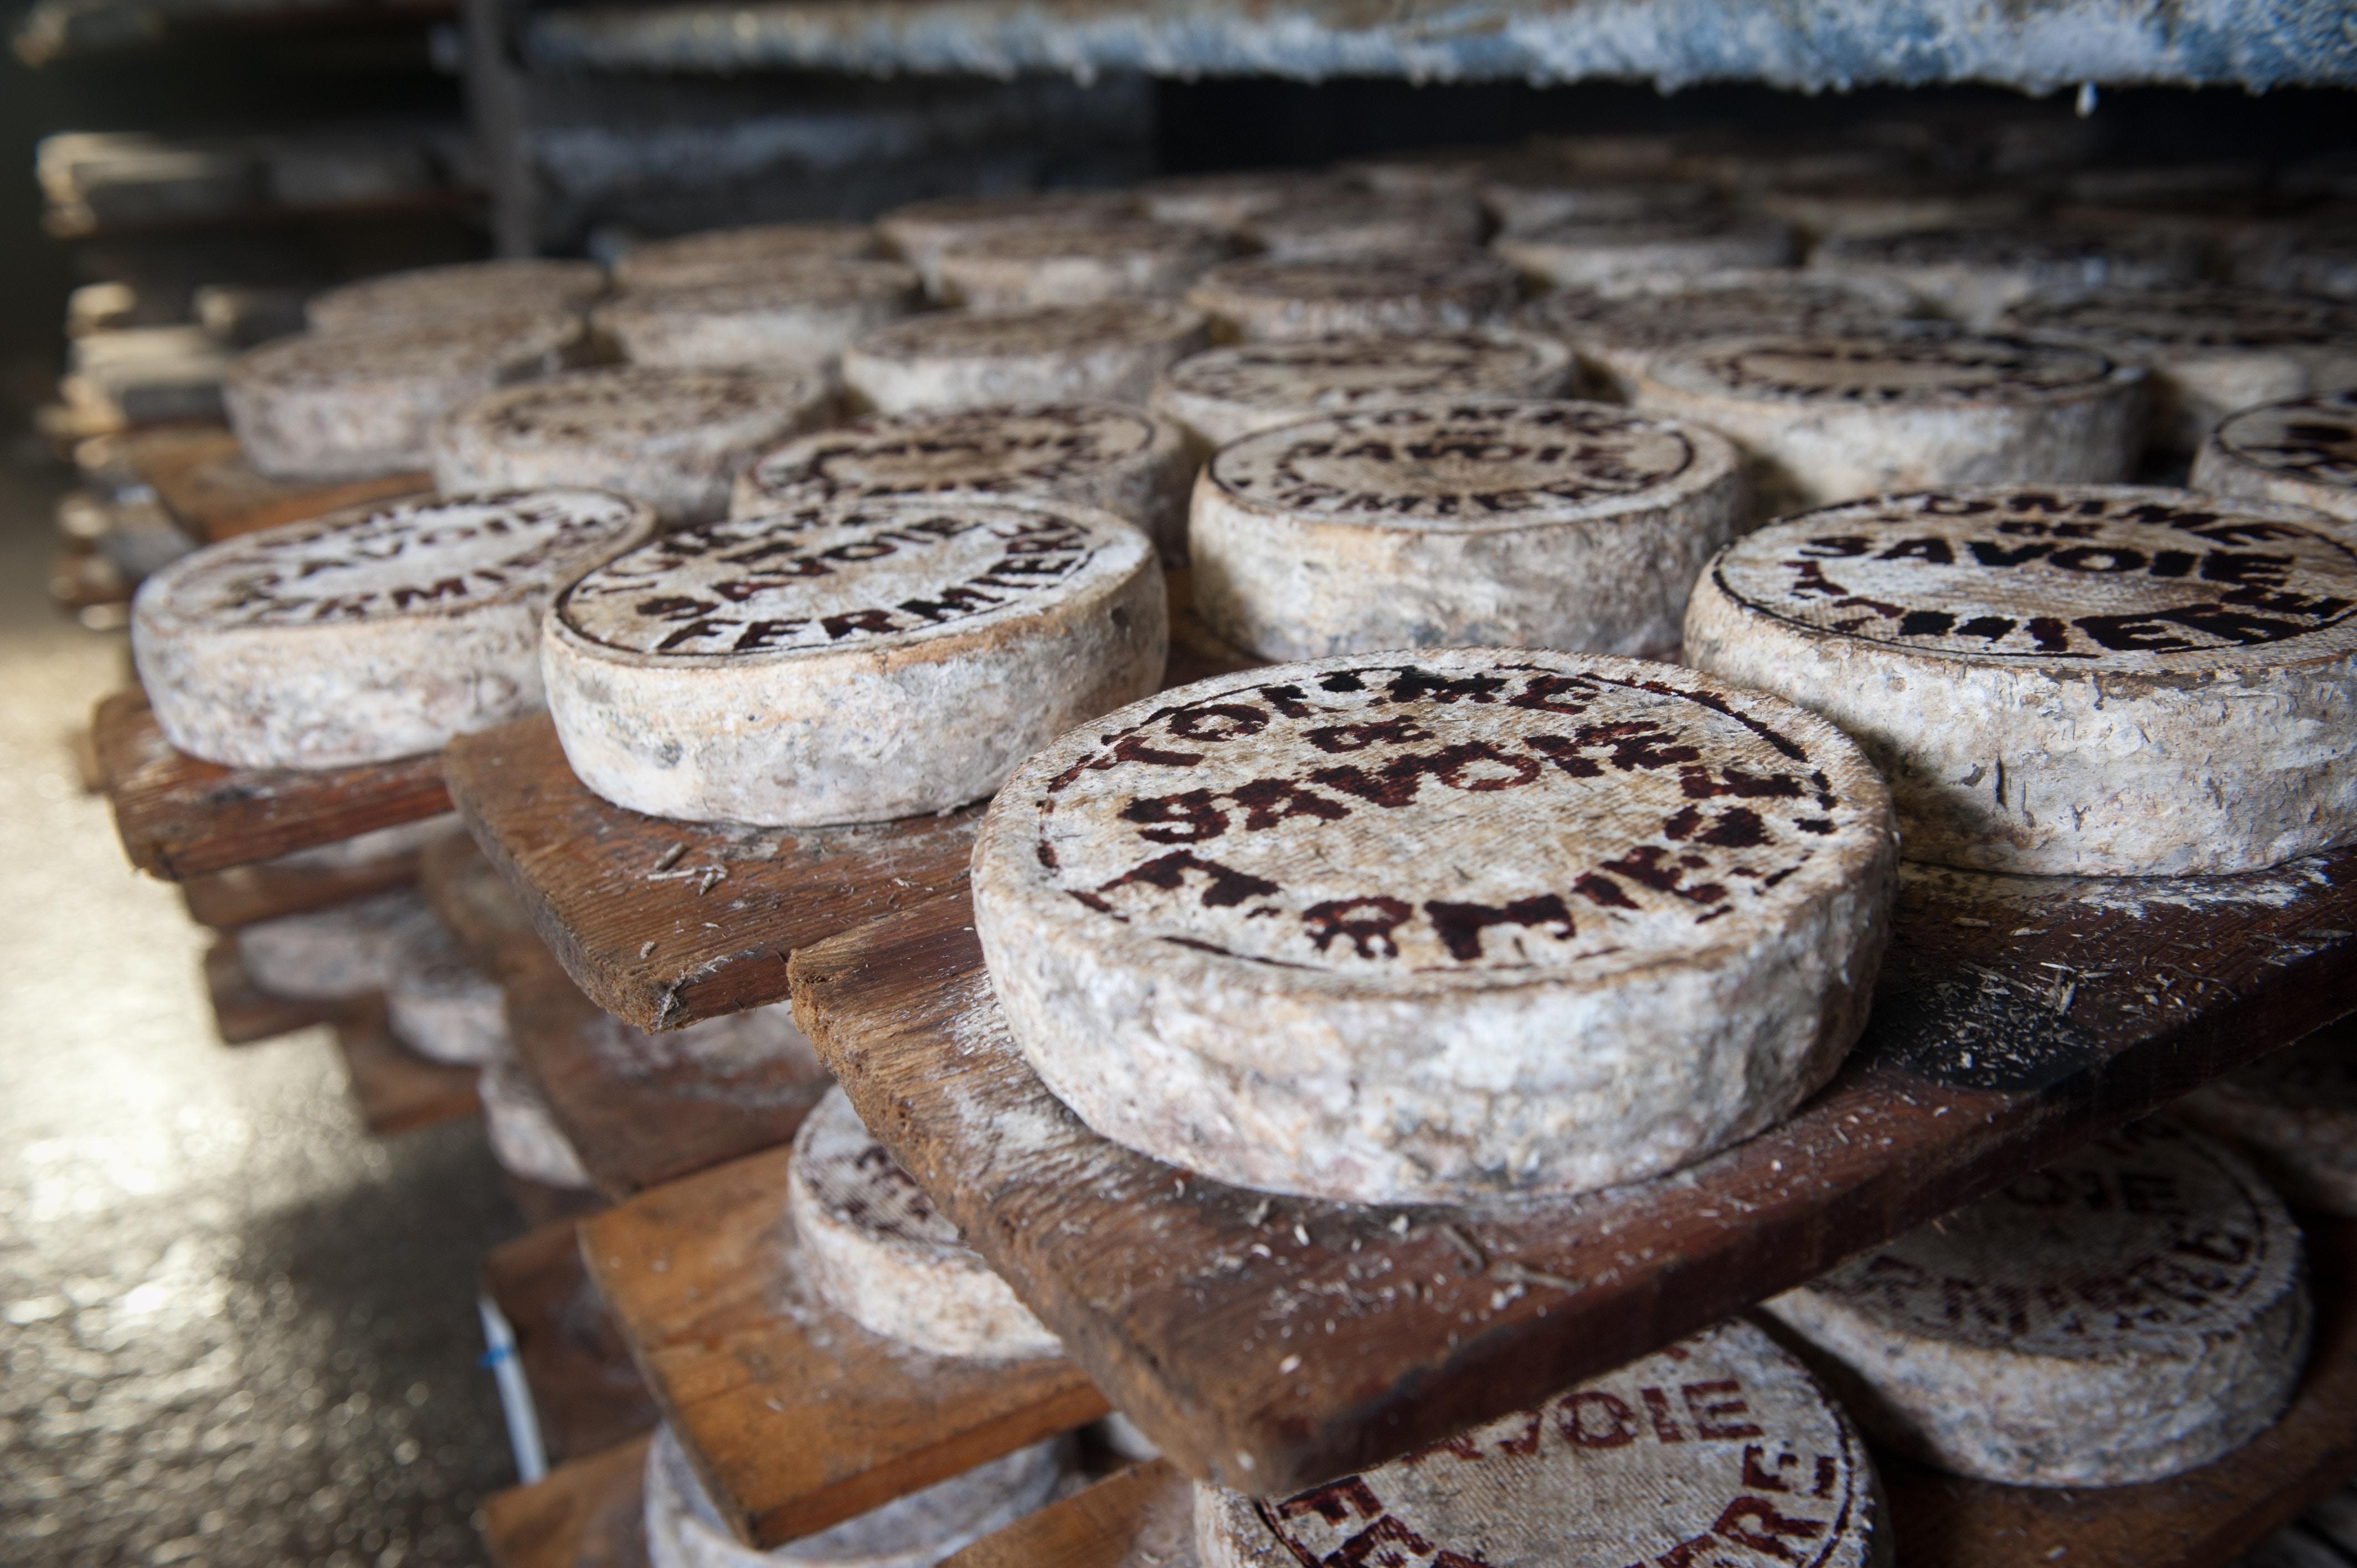 Understanding Mold on Cheese & Salami